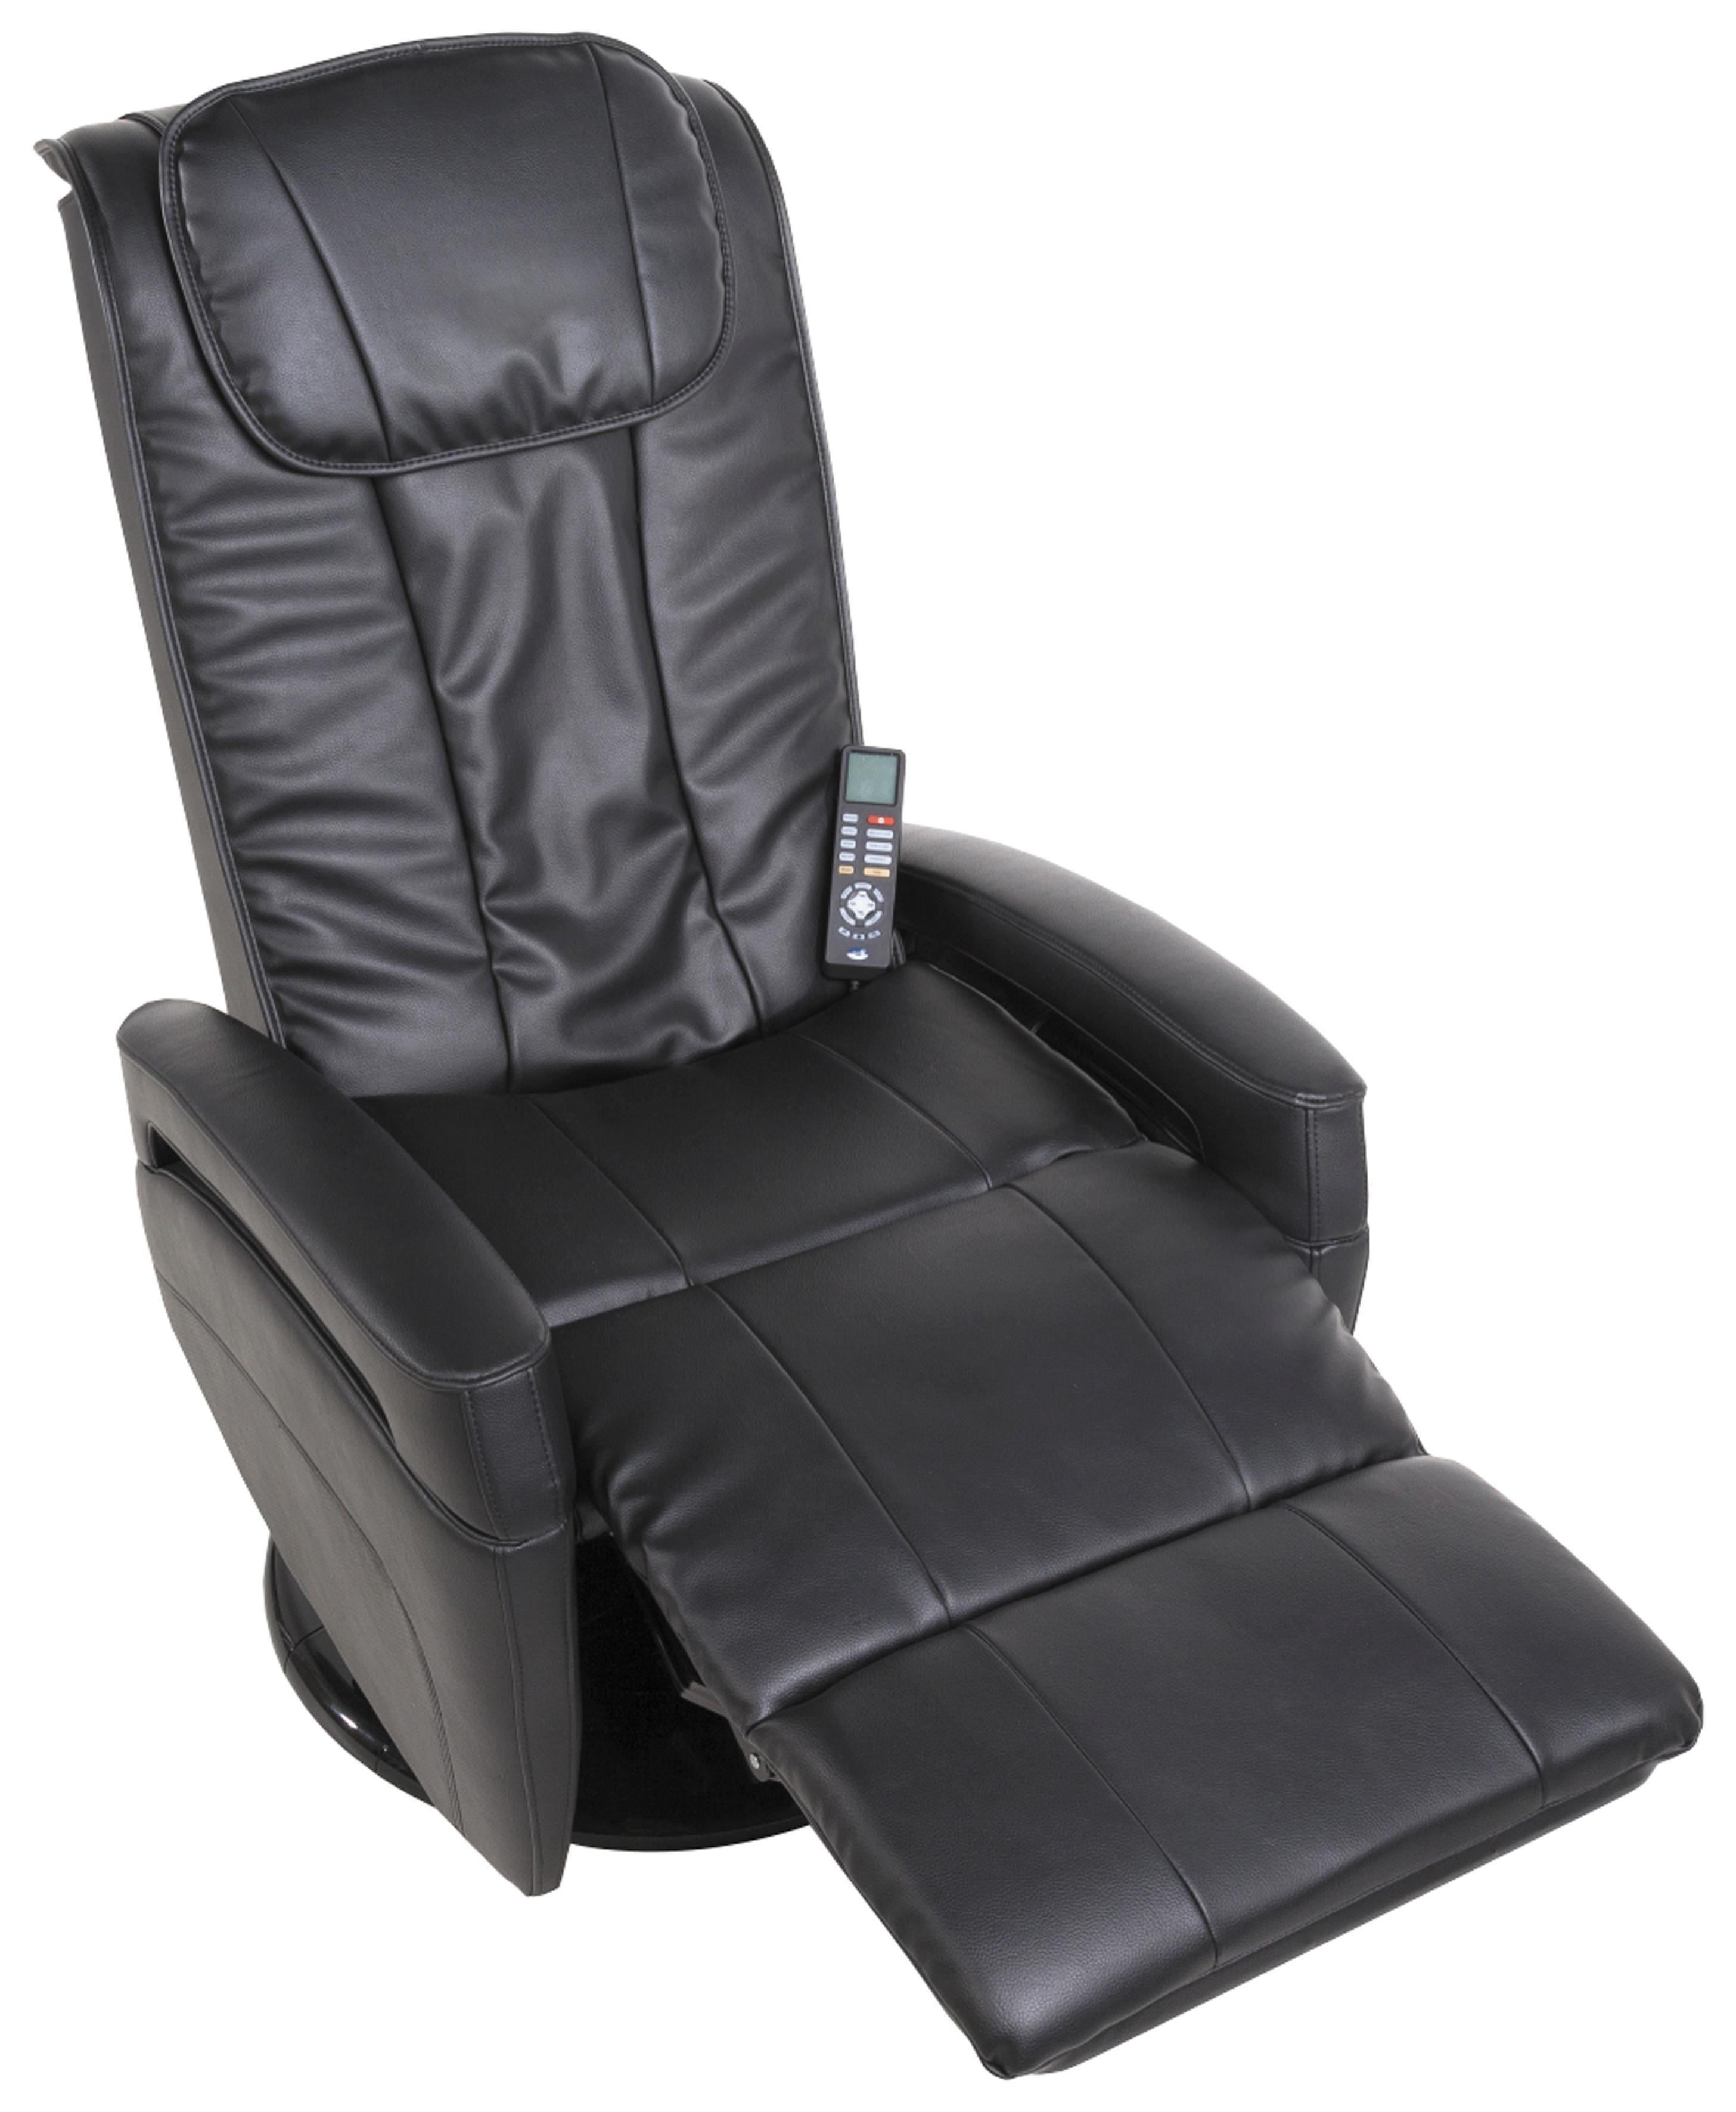 Massagesessel | Wohnzimmer > Sessel > Massagesessel | Kunstleder